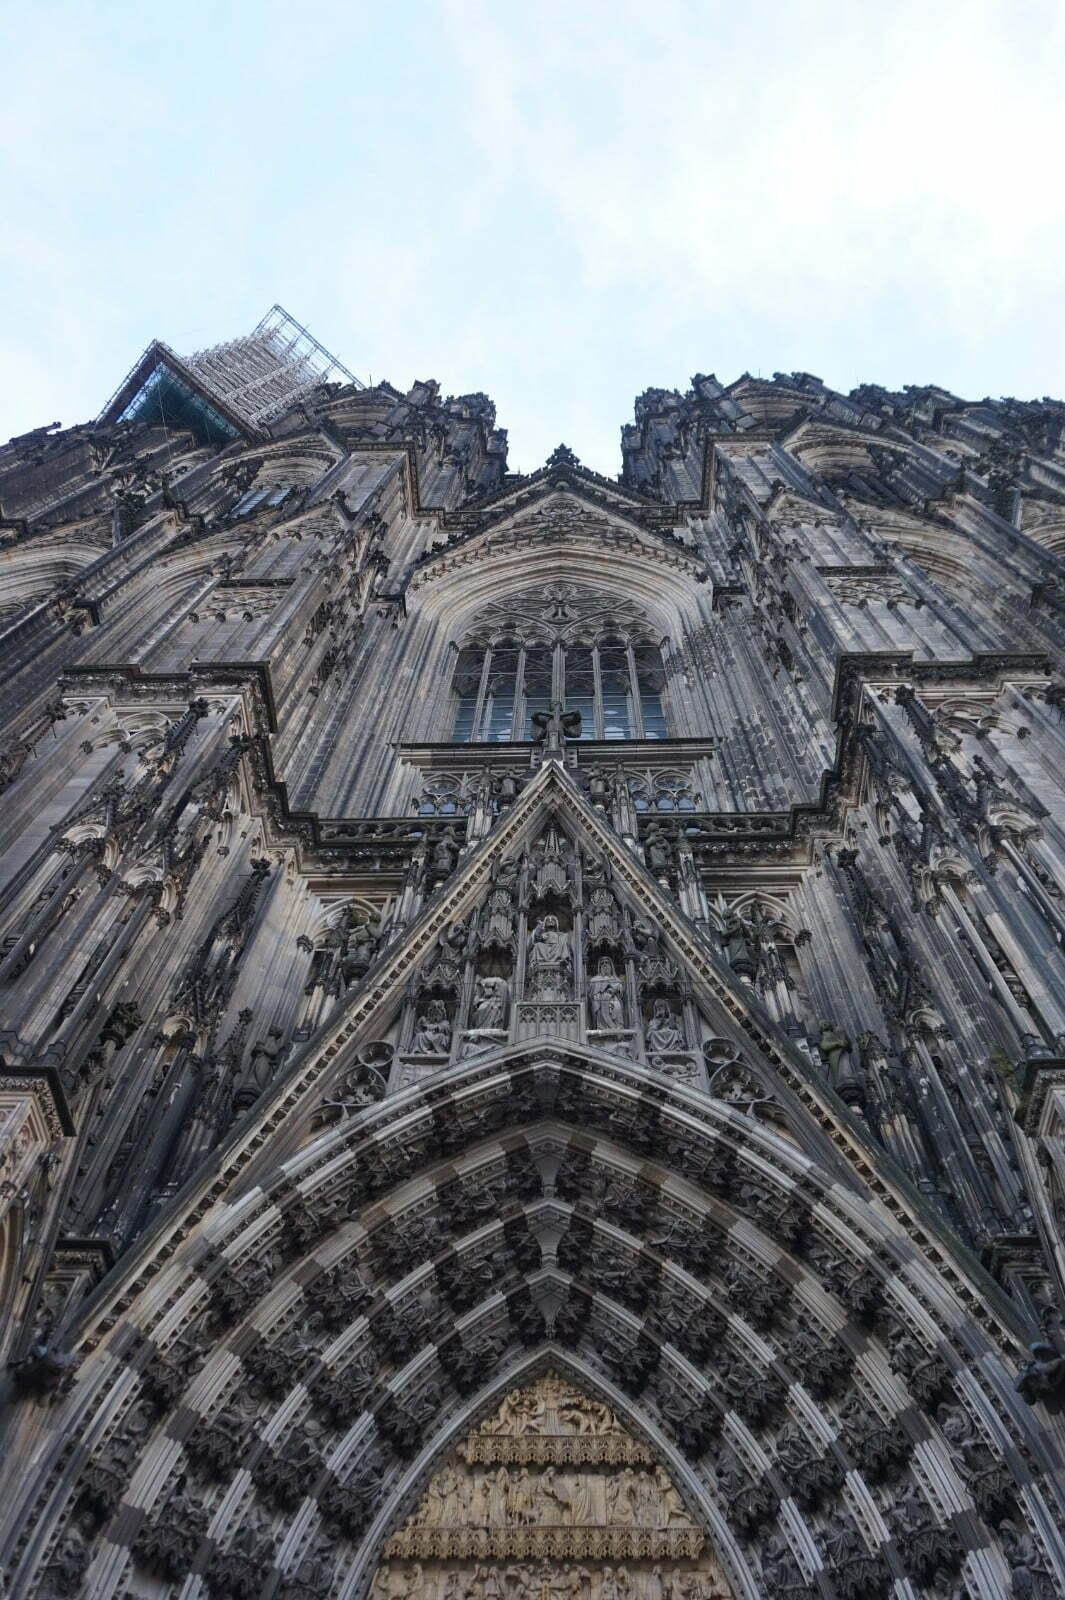 Cologne's Cathedral, Love Lock Bridge & Koln Triangle: A Walk Of Surprises 1